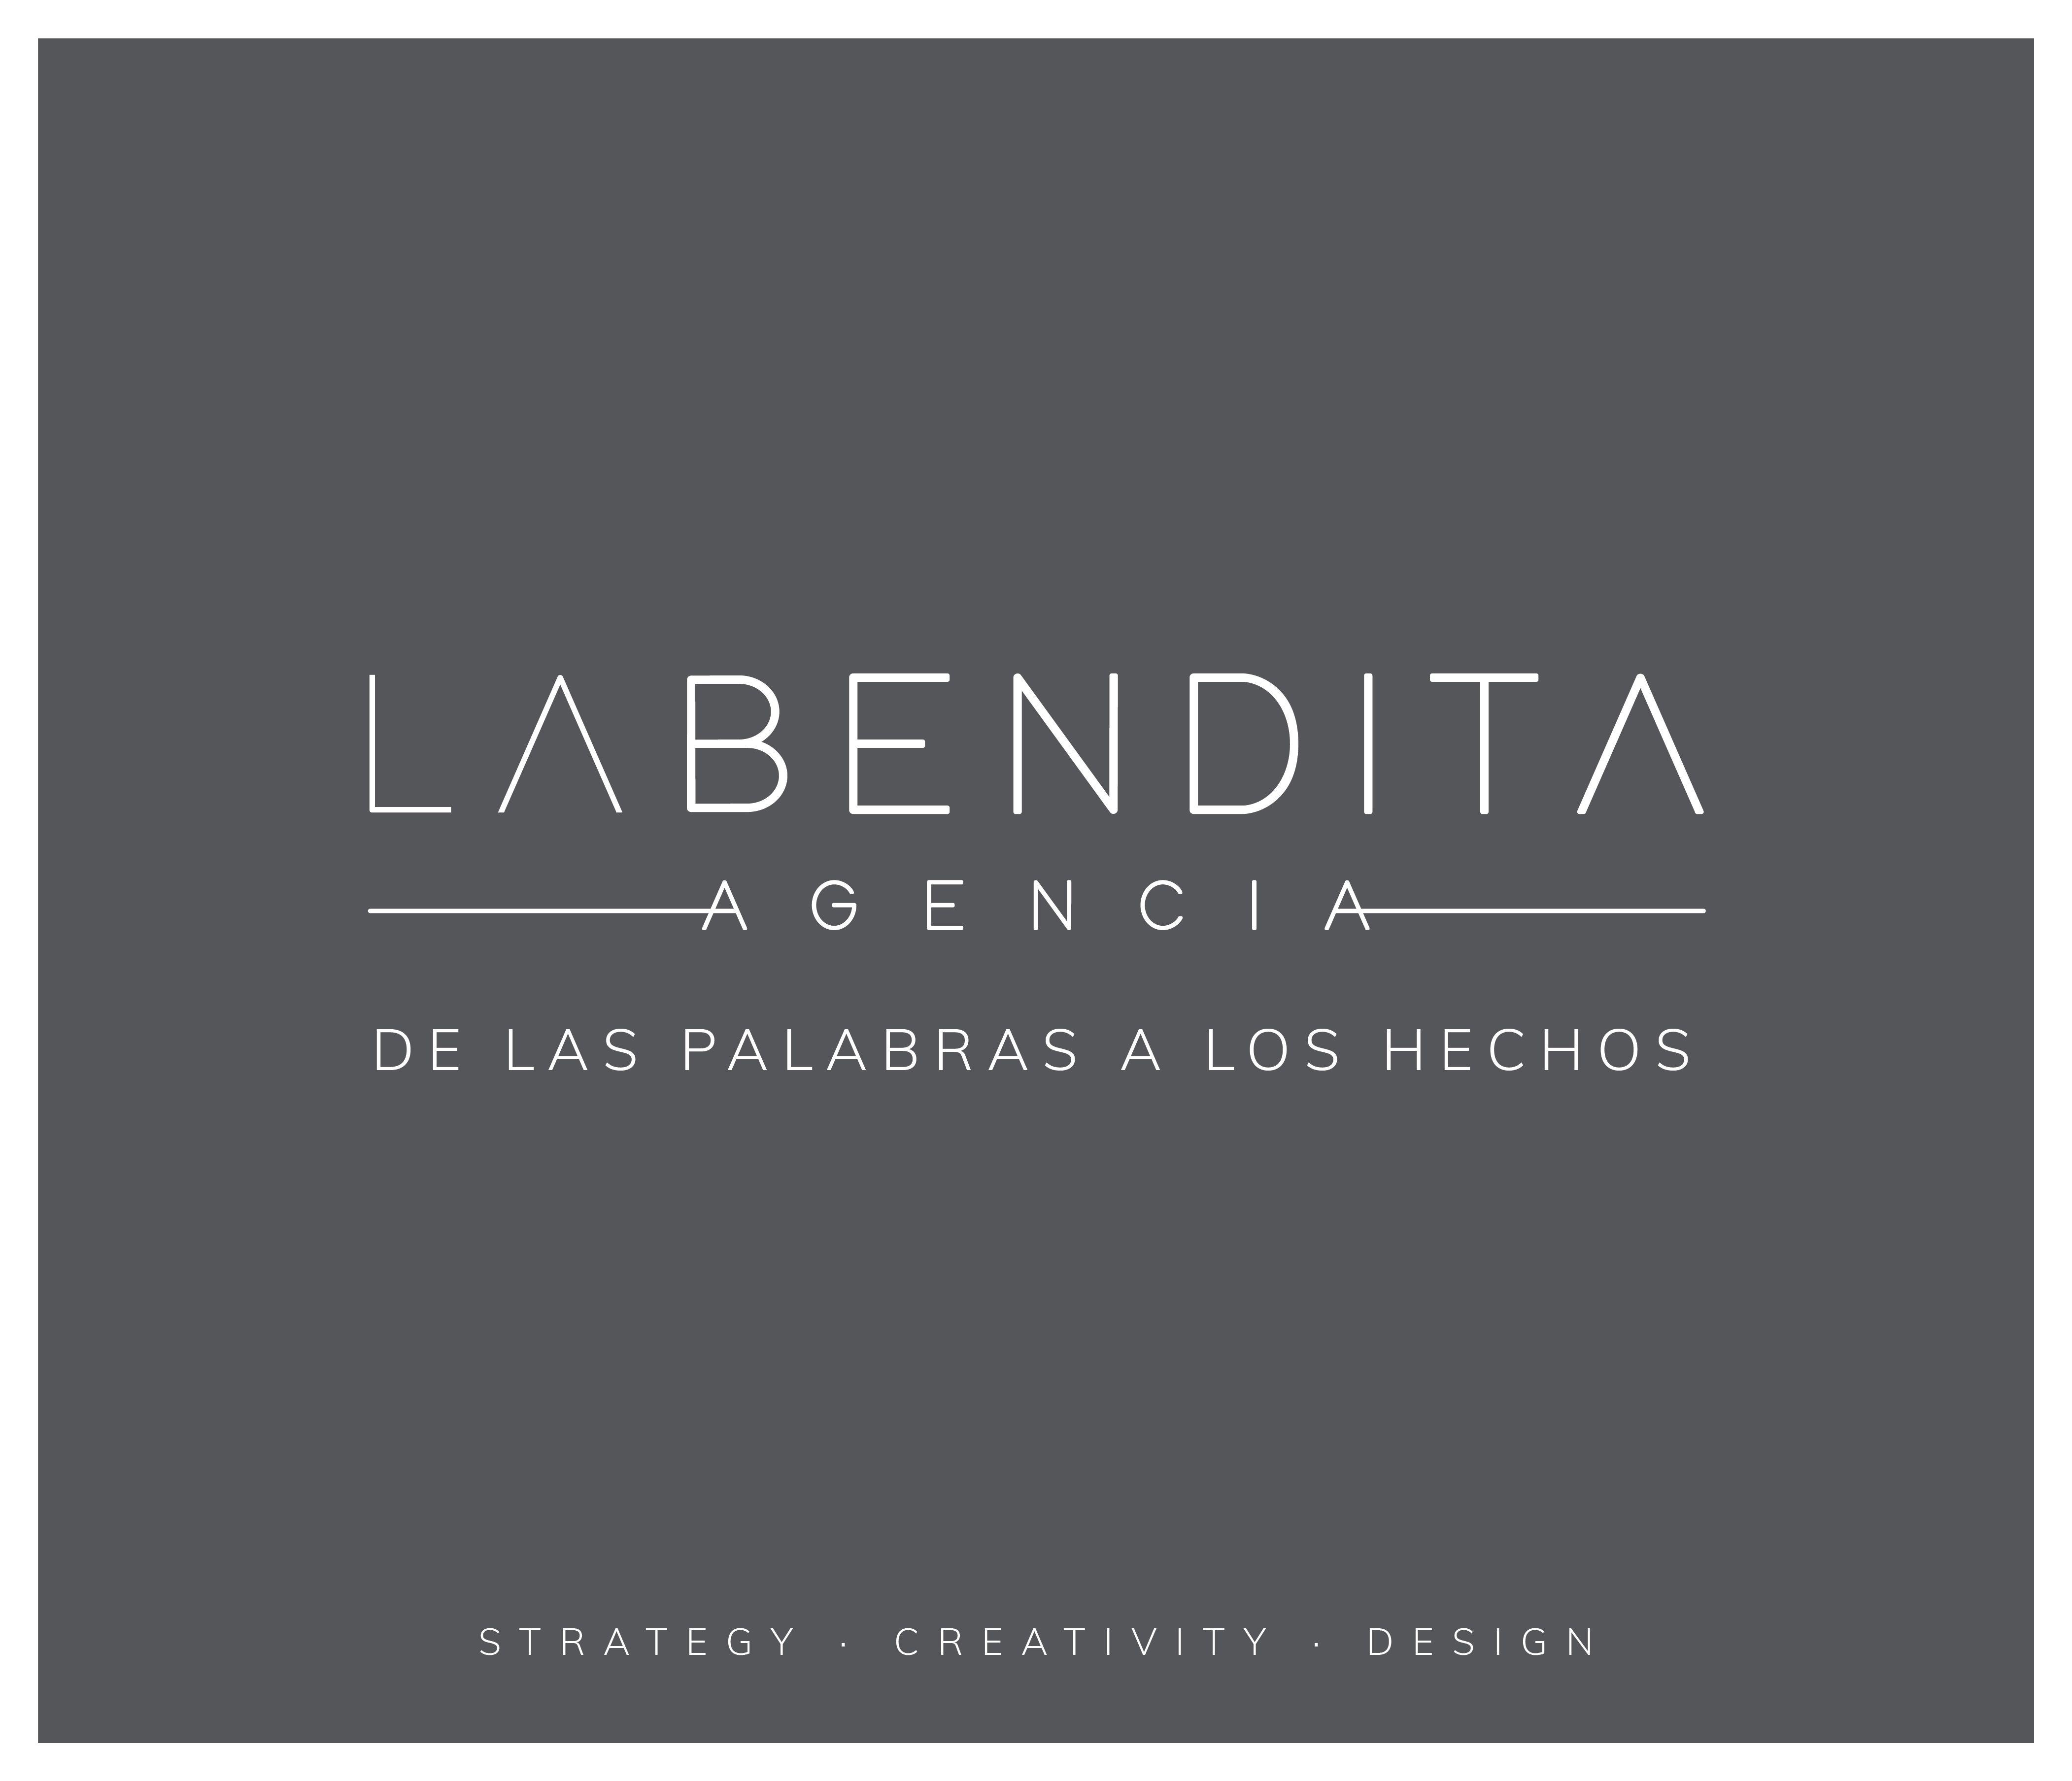 Foto de La Bendita Agencia